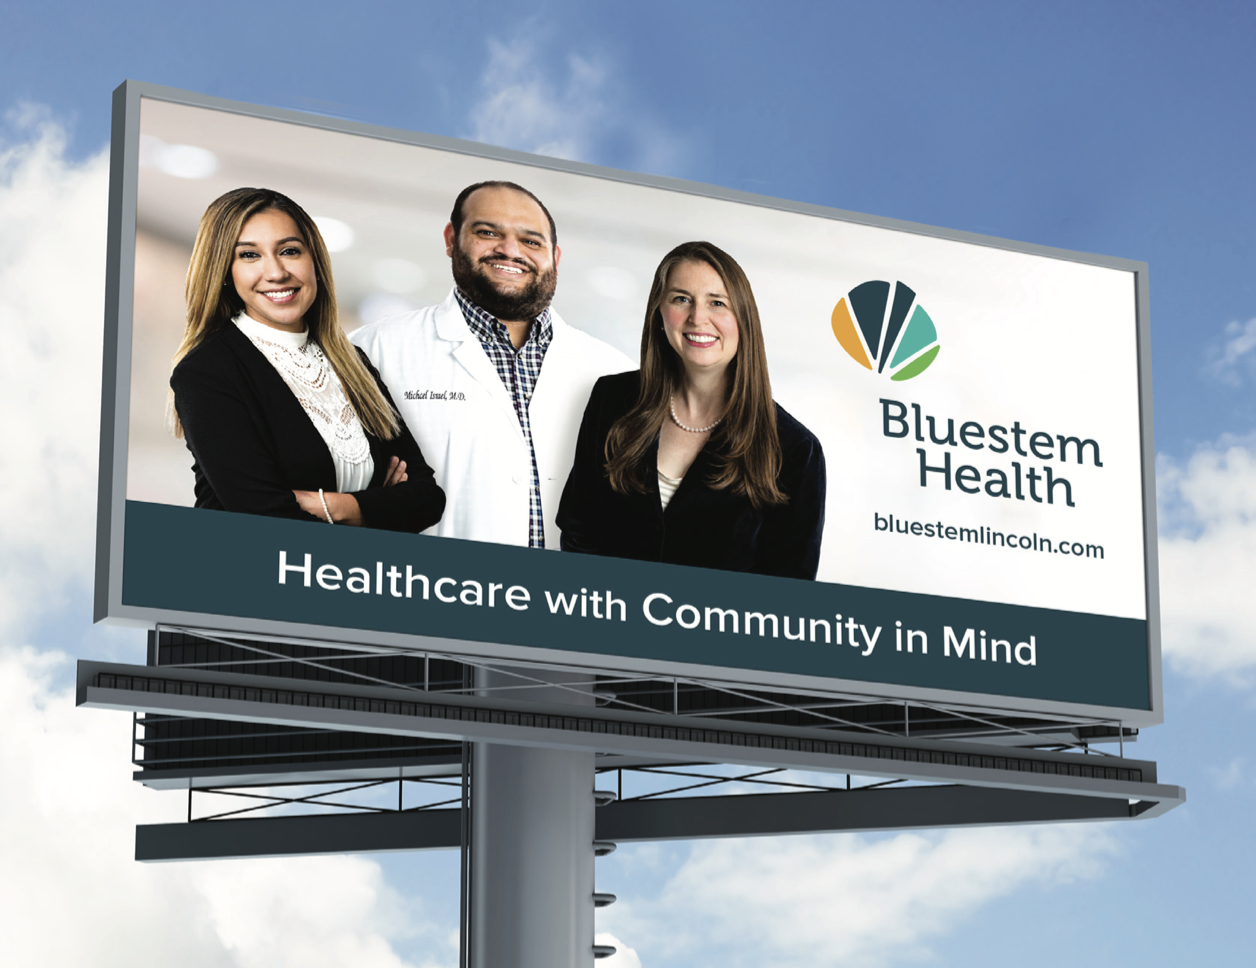 Bluestem Health - Healthcare with Community in Mind Billboard Display